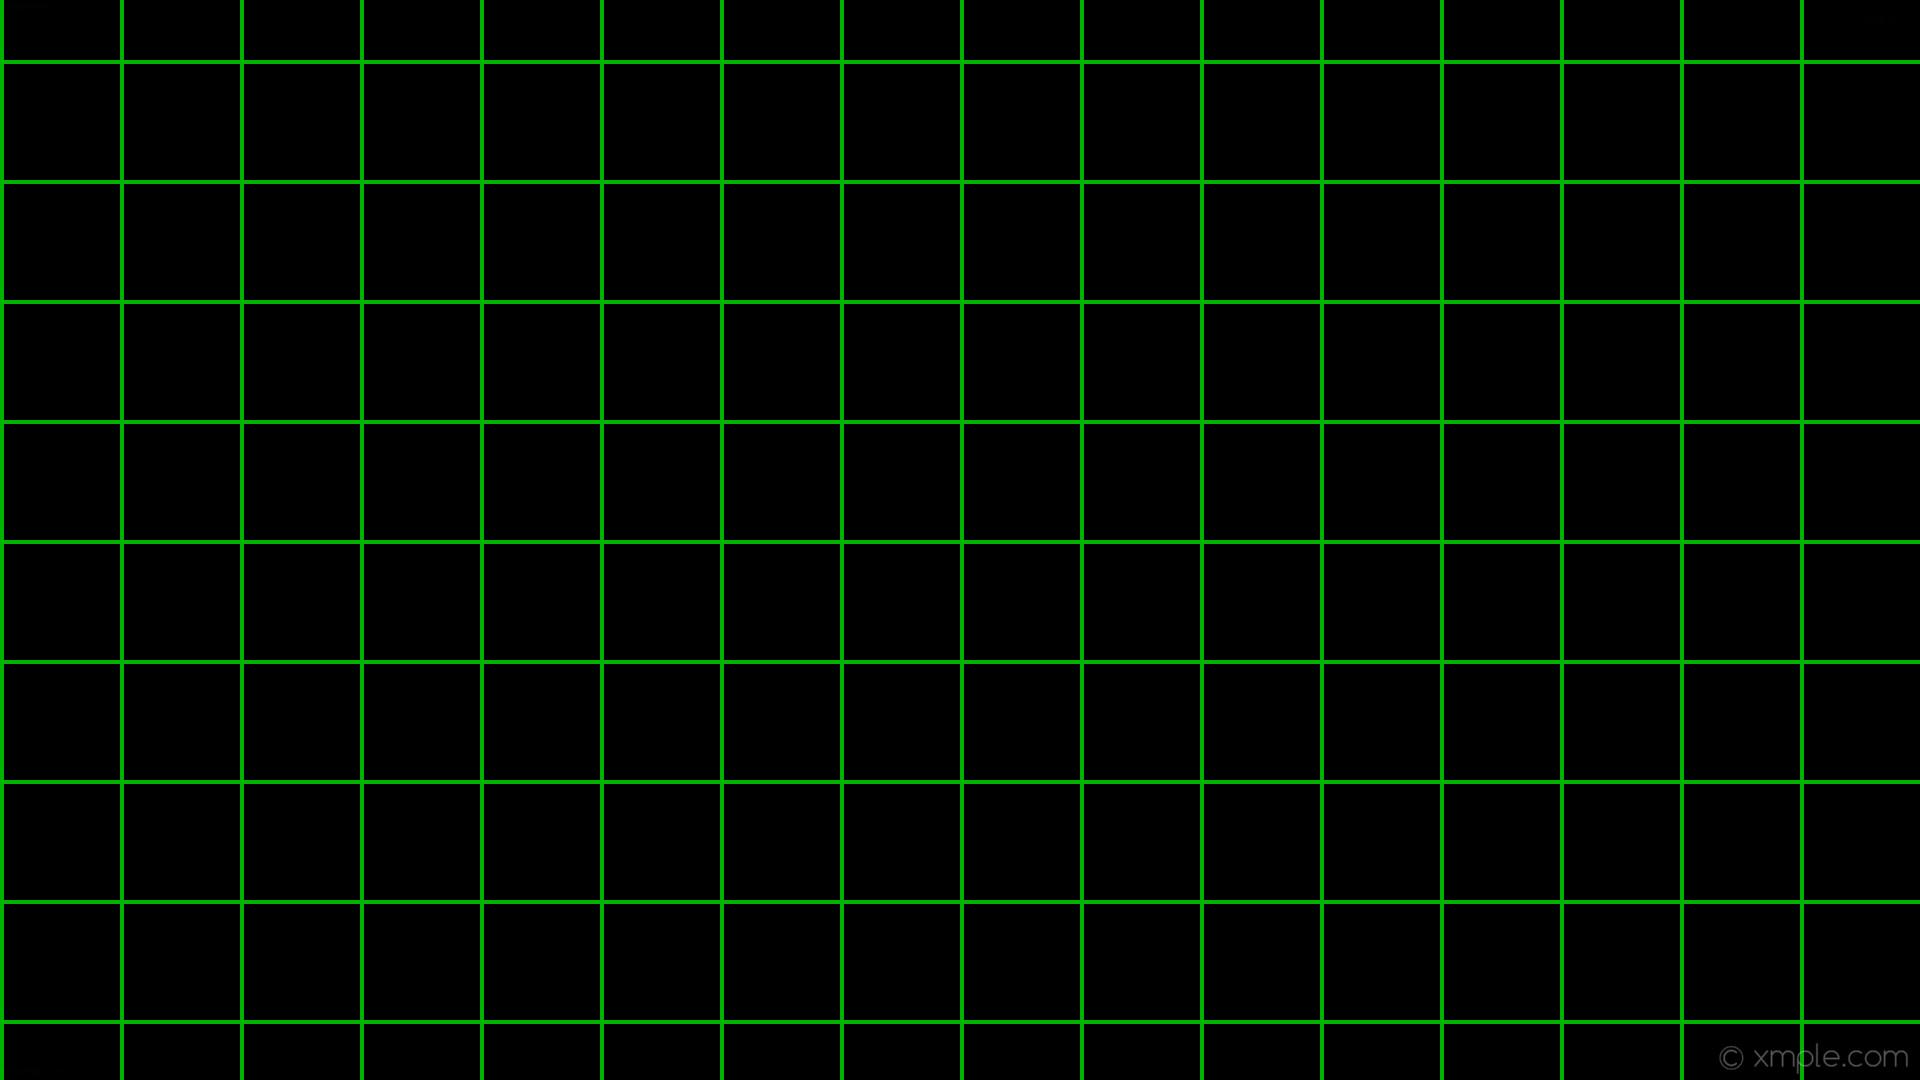 Res: 1920x1080, wallpaper graph paper black green grid lime #000000 #00ff00 0° 4px 120px